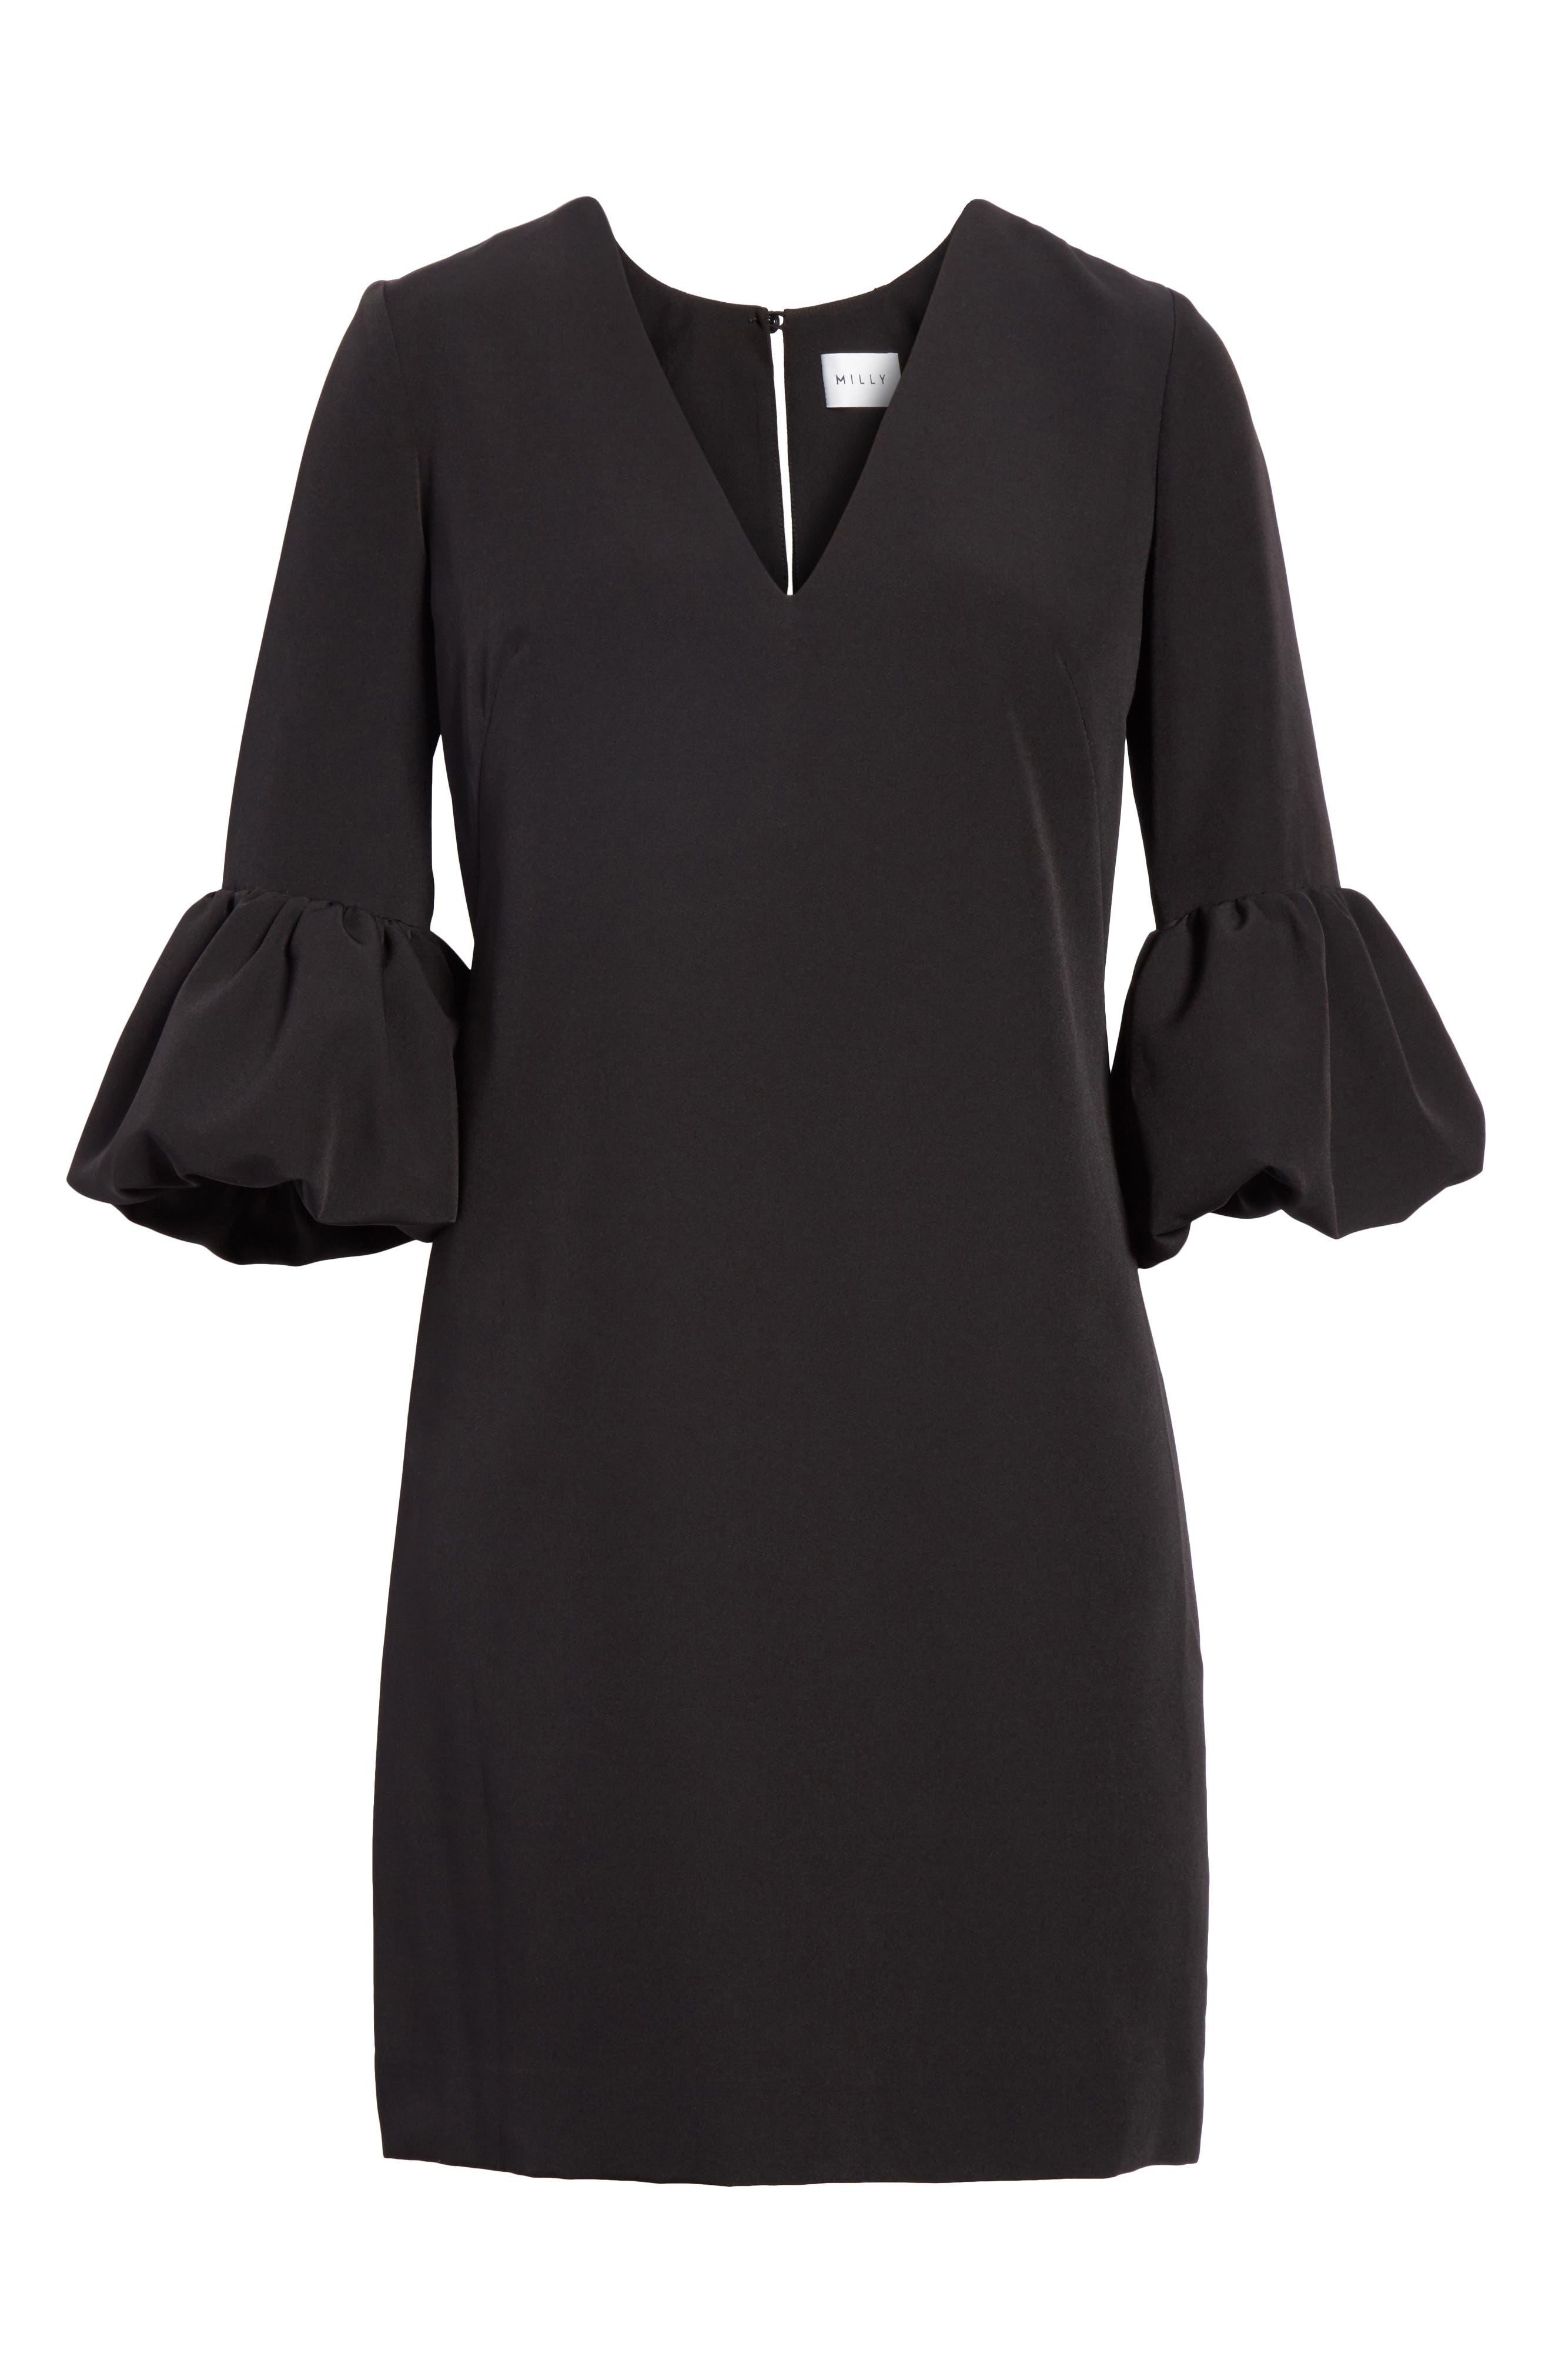 Mandy Ruffle Cuff Shift Dress,                             Alternate thumbnail 7, color,                             001